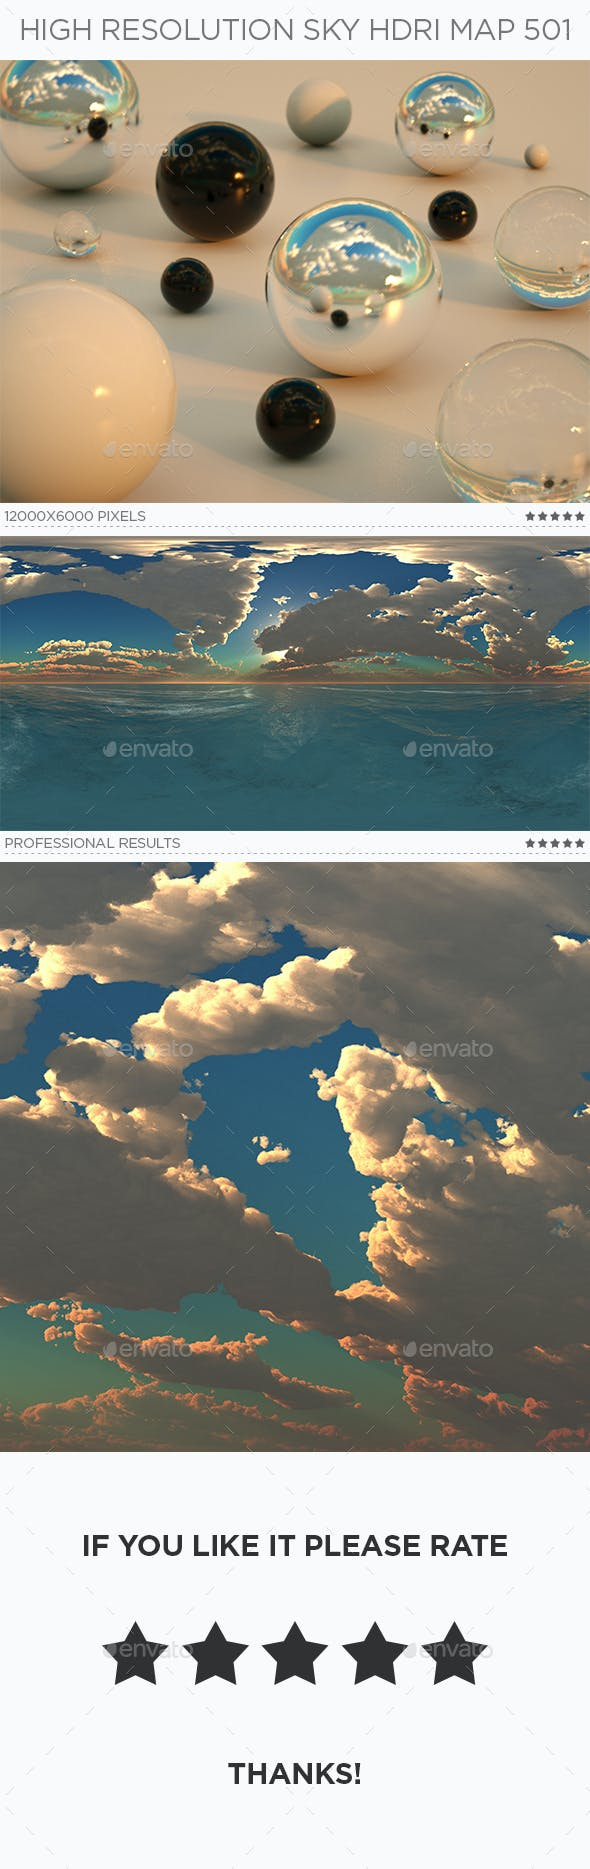 High Resolution Sky HDRi Map 501 - 3DOcean Item for Sale